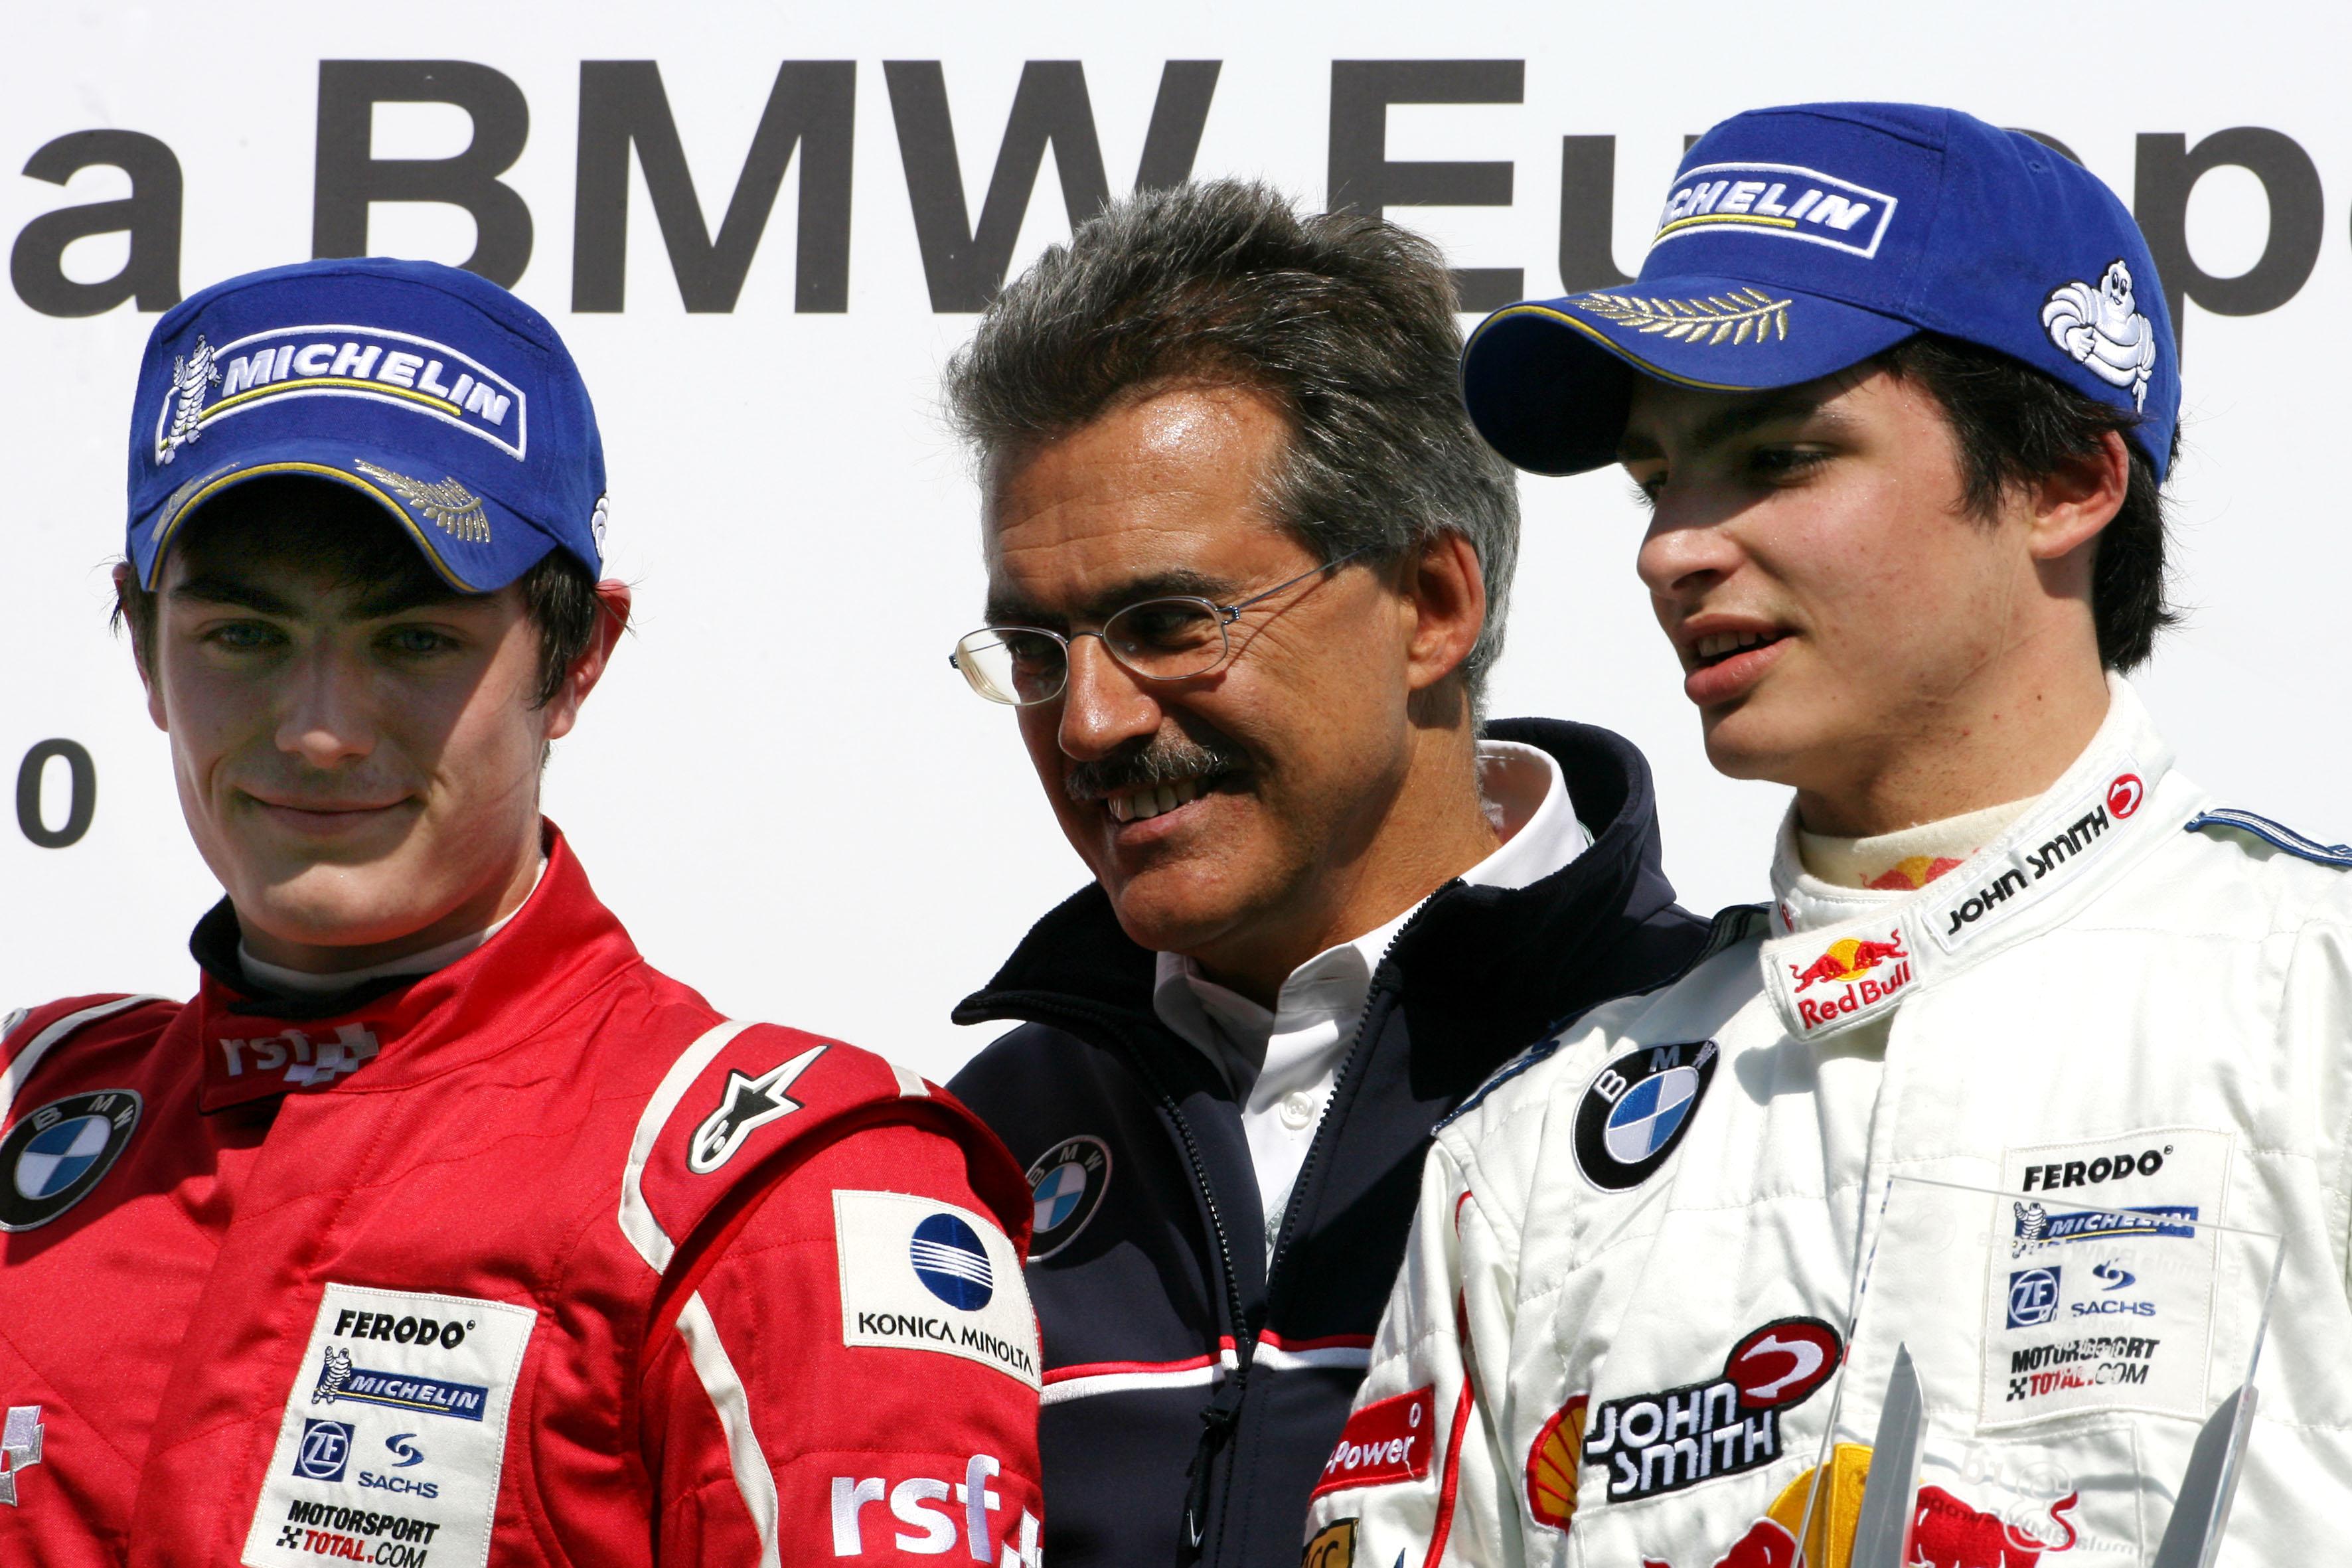 Formula Bmw Europe 2010, Rd 01 & 02, Barcelona, Spain, Saturday Podium